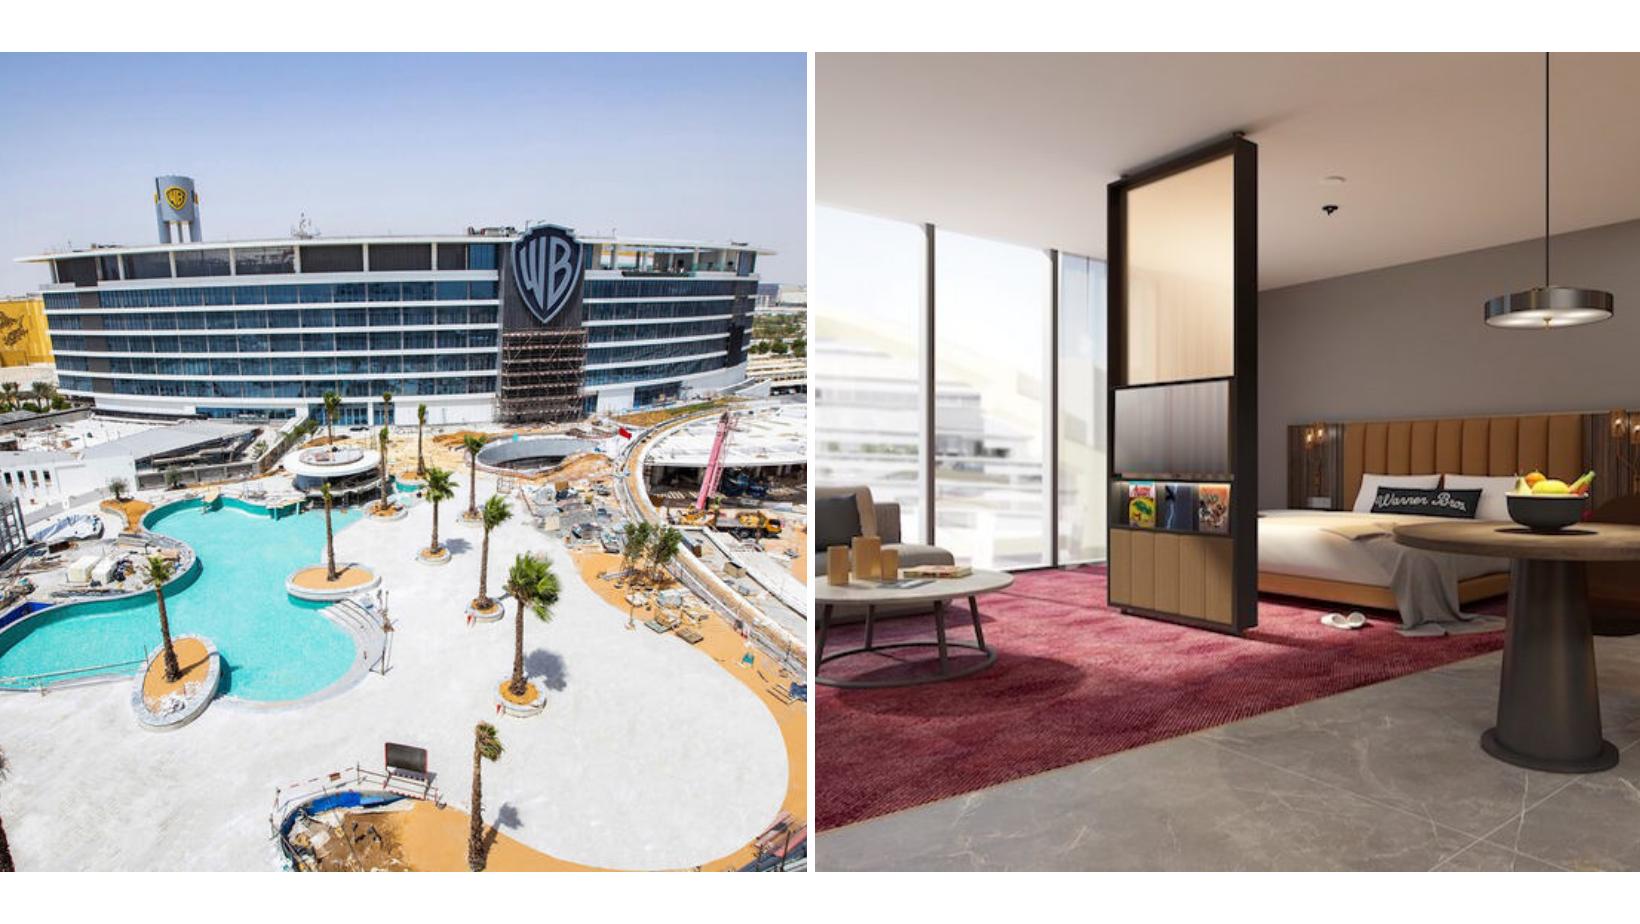 Warner Bros. Abu Dhabi